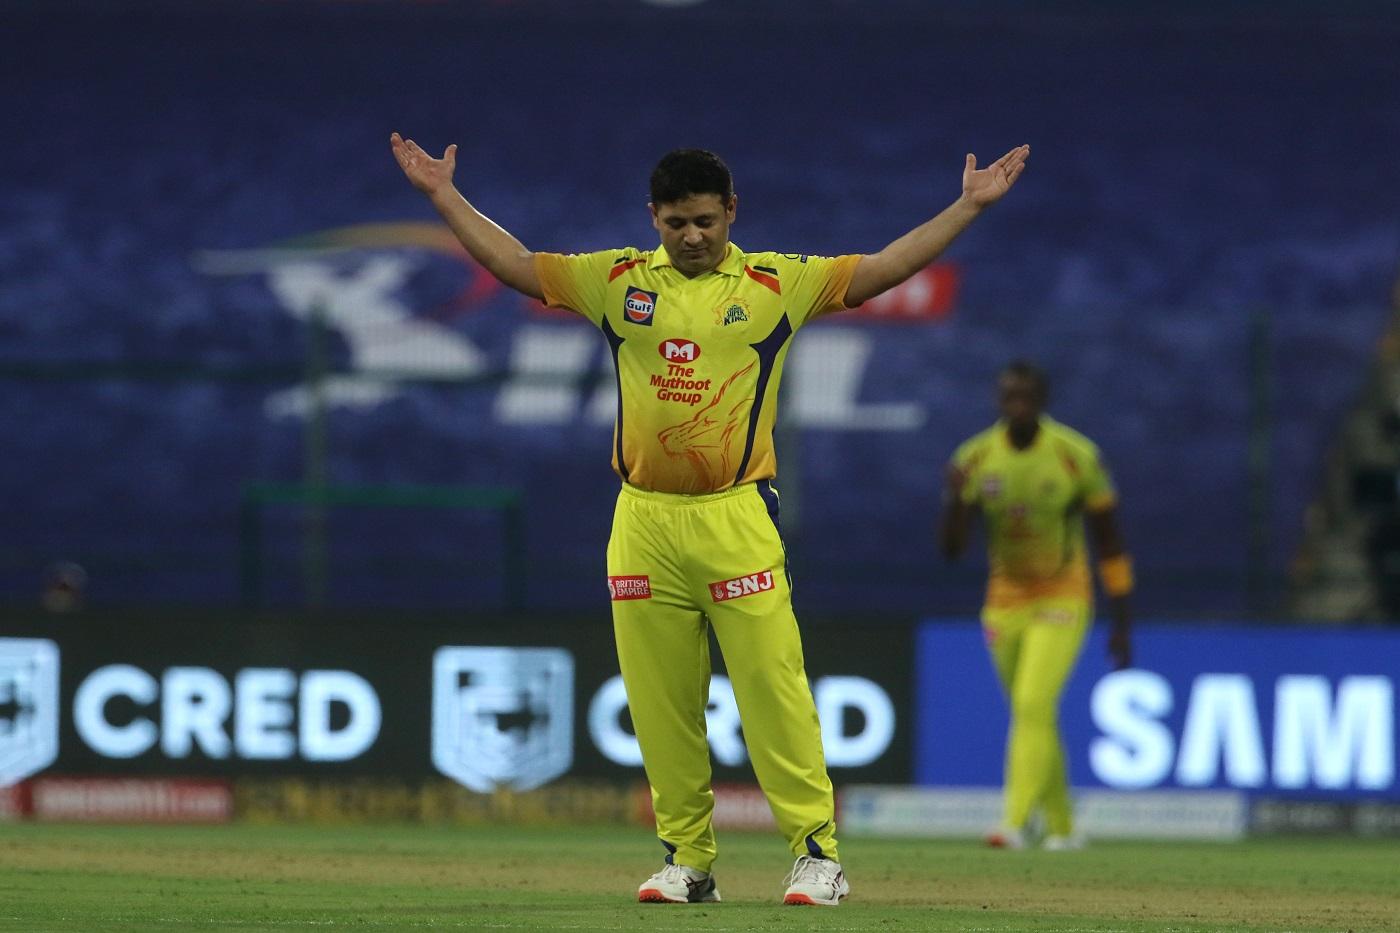 Piyush Chawla celebrates Rohit Sharma's wicket, Chennai Super Kings v Mumbai Indians, IPL 2020, Abu Dhabi, September 19, 2020 ©BCCI